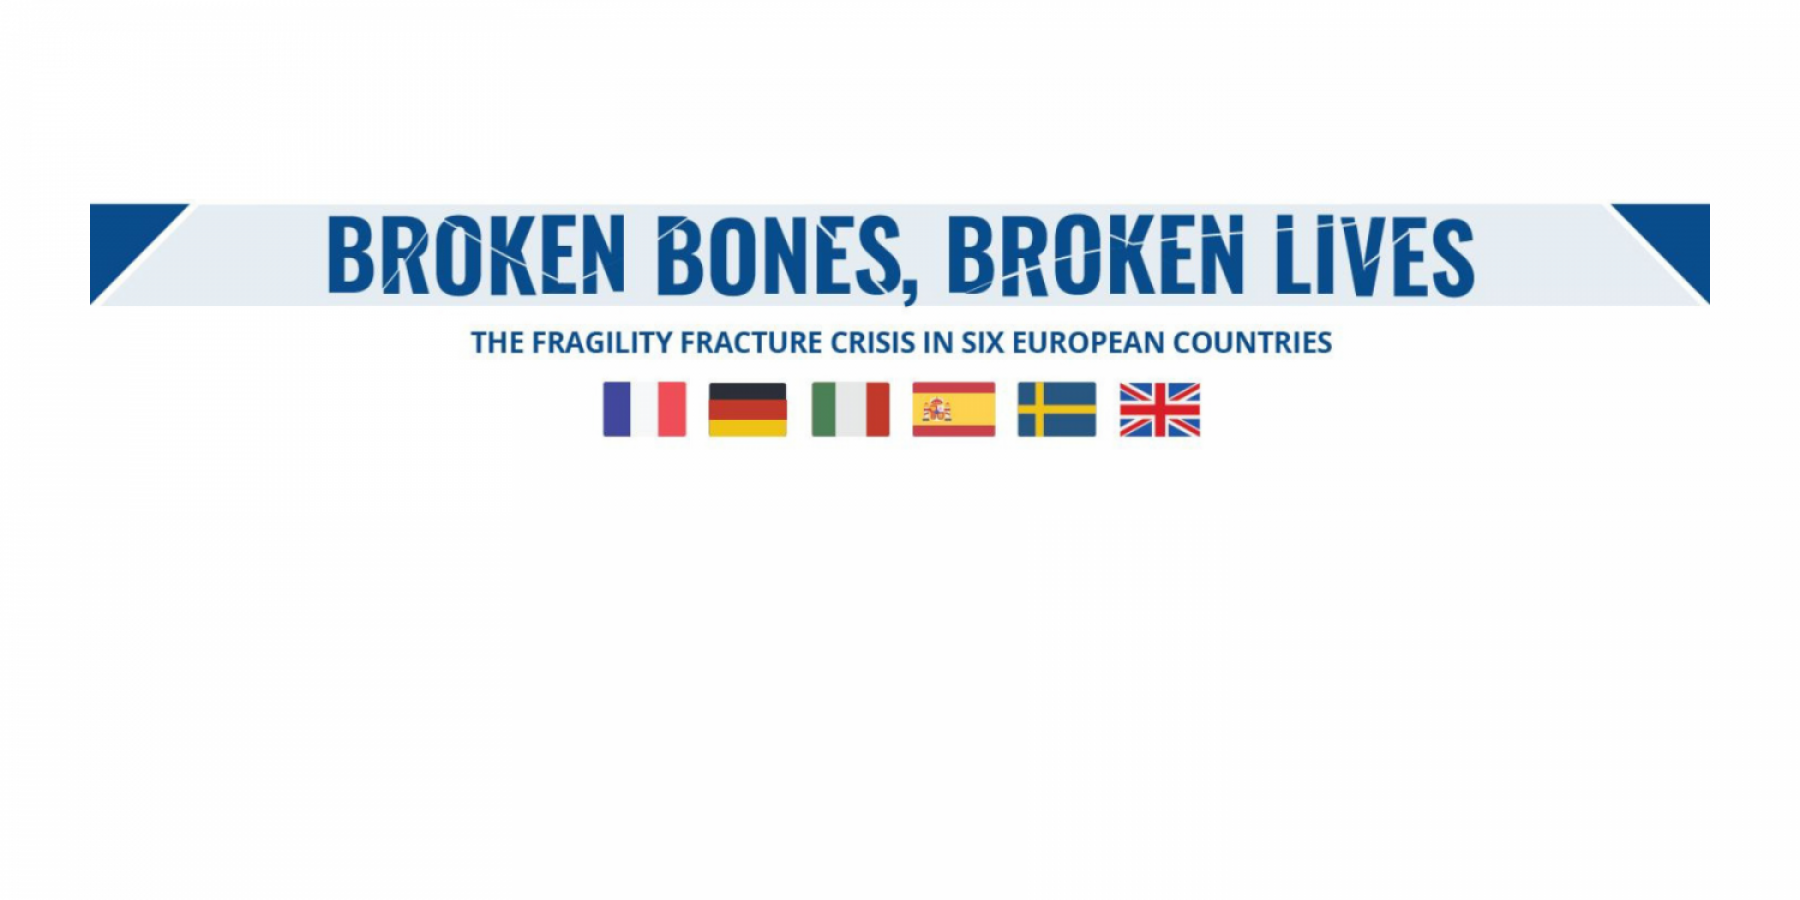 International Osteoporosis Foundation